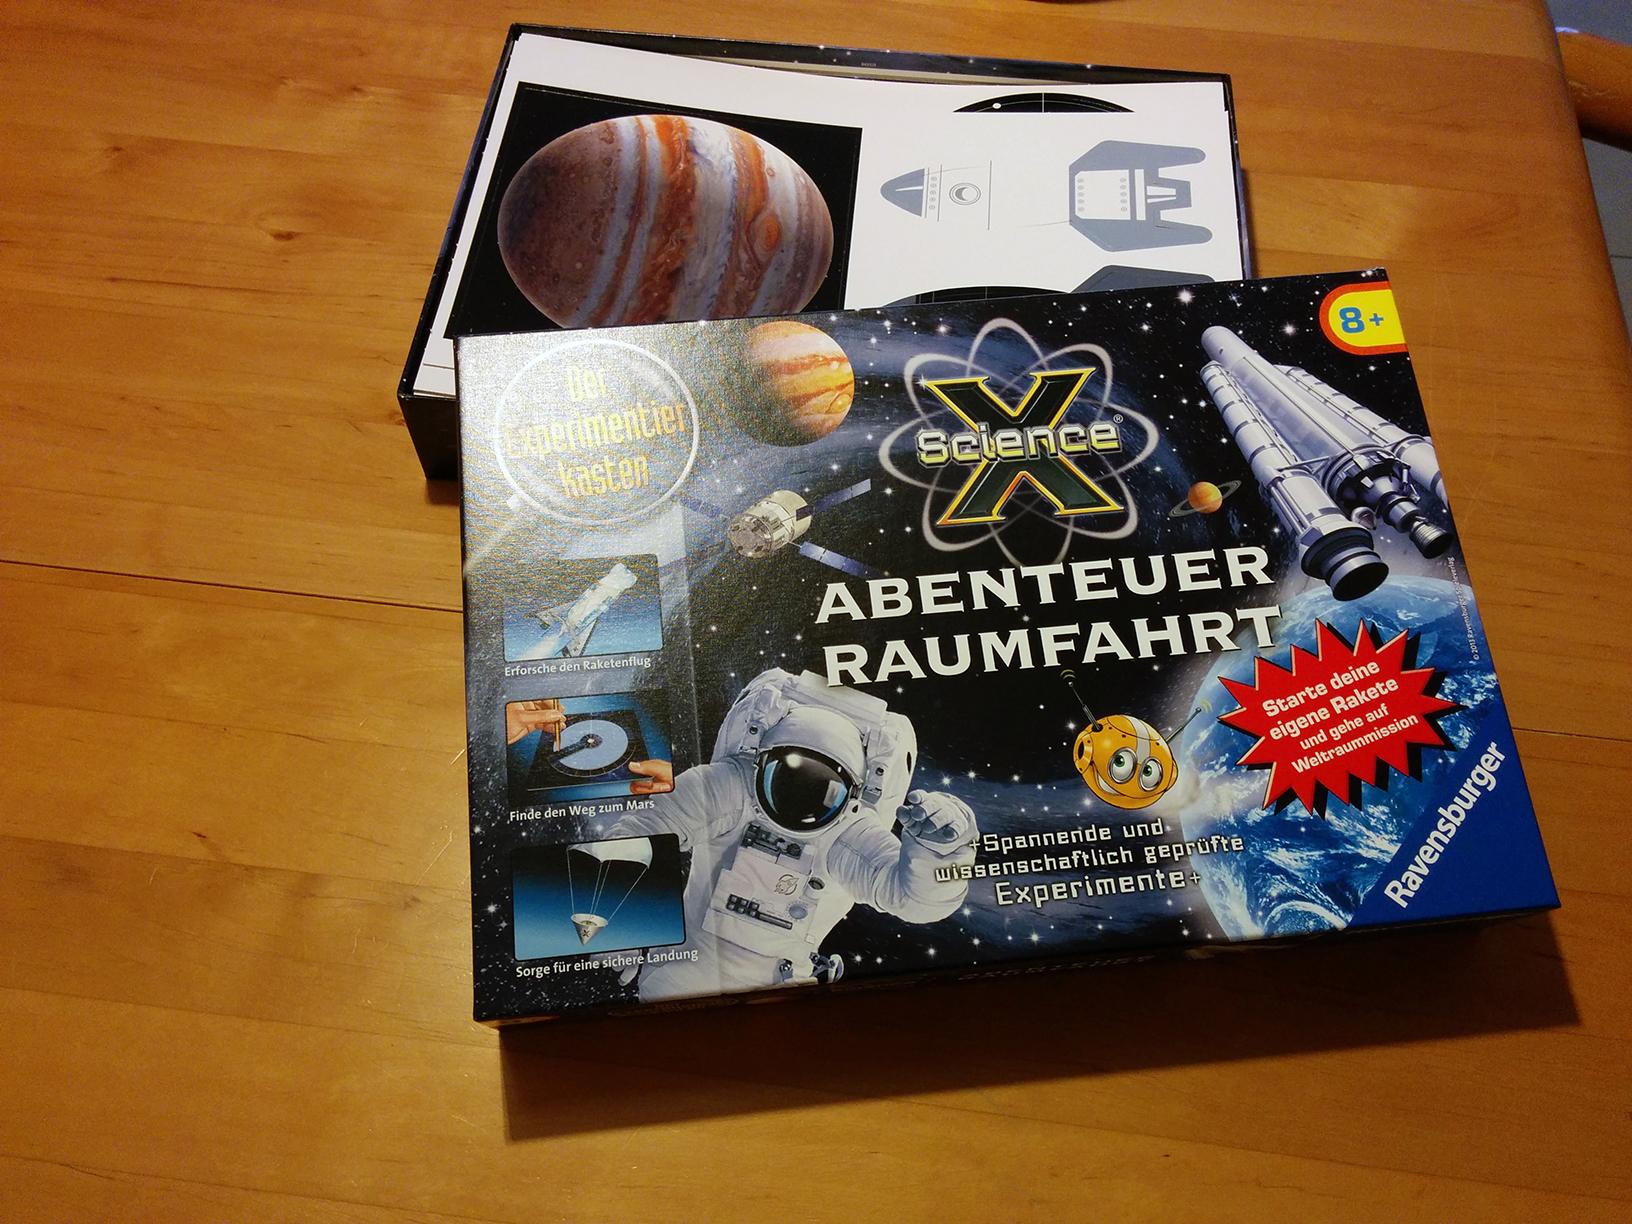 Credit: Ute Gerhardt, Experimentierkasten Abenteuer Raumfahrt